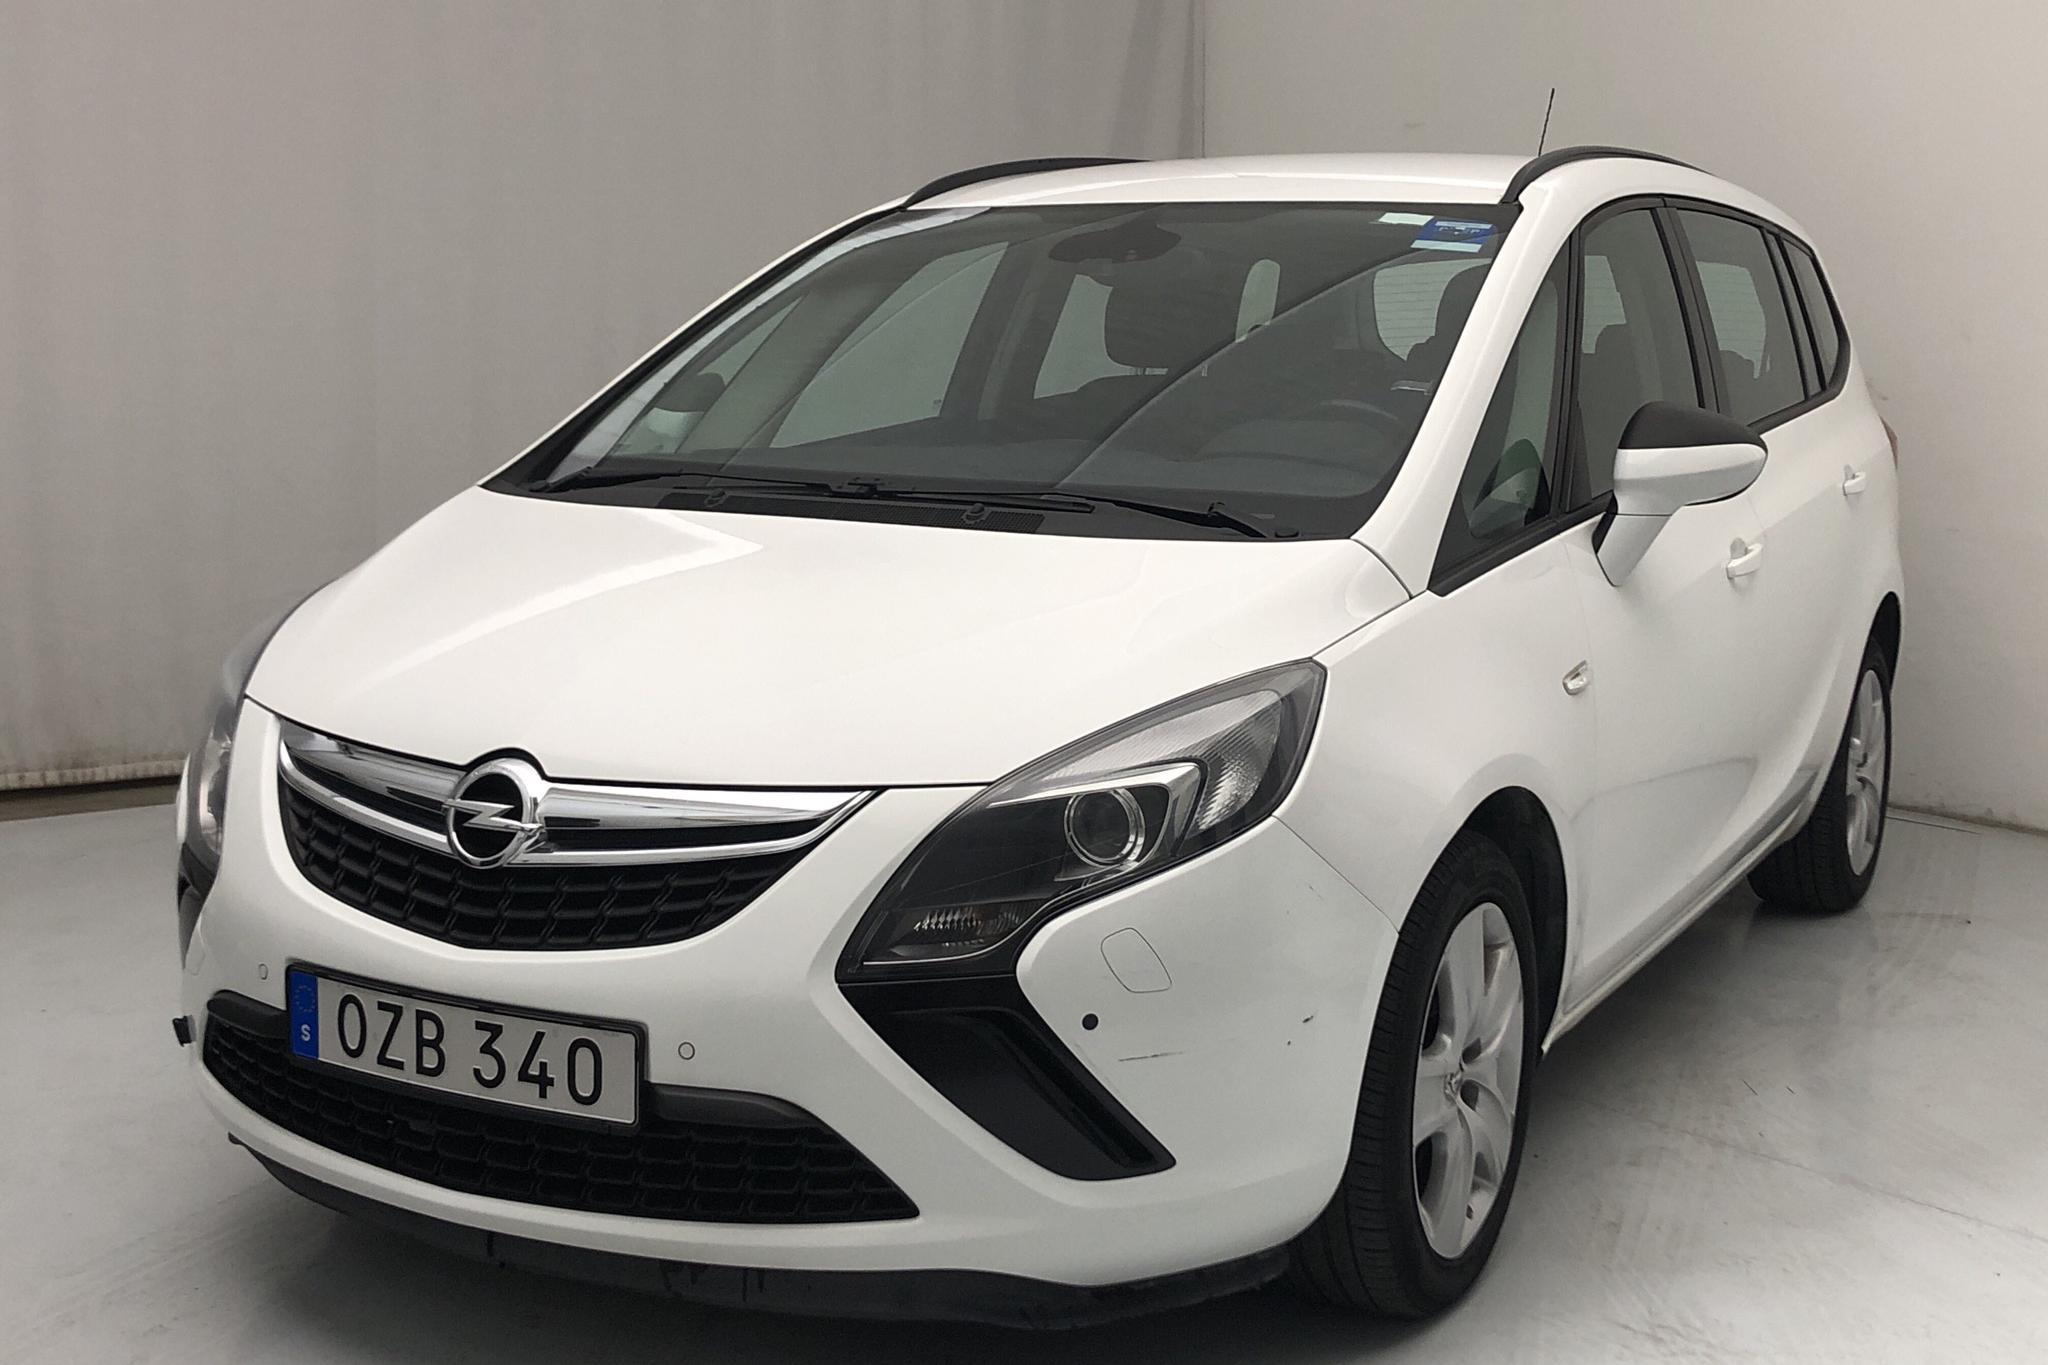 Opel Zafira Tourer 1.6 CNG ecoFLEX (150hk)